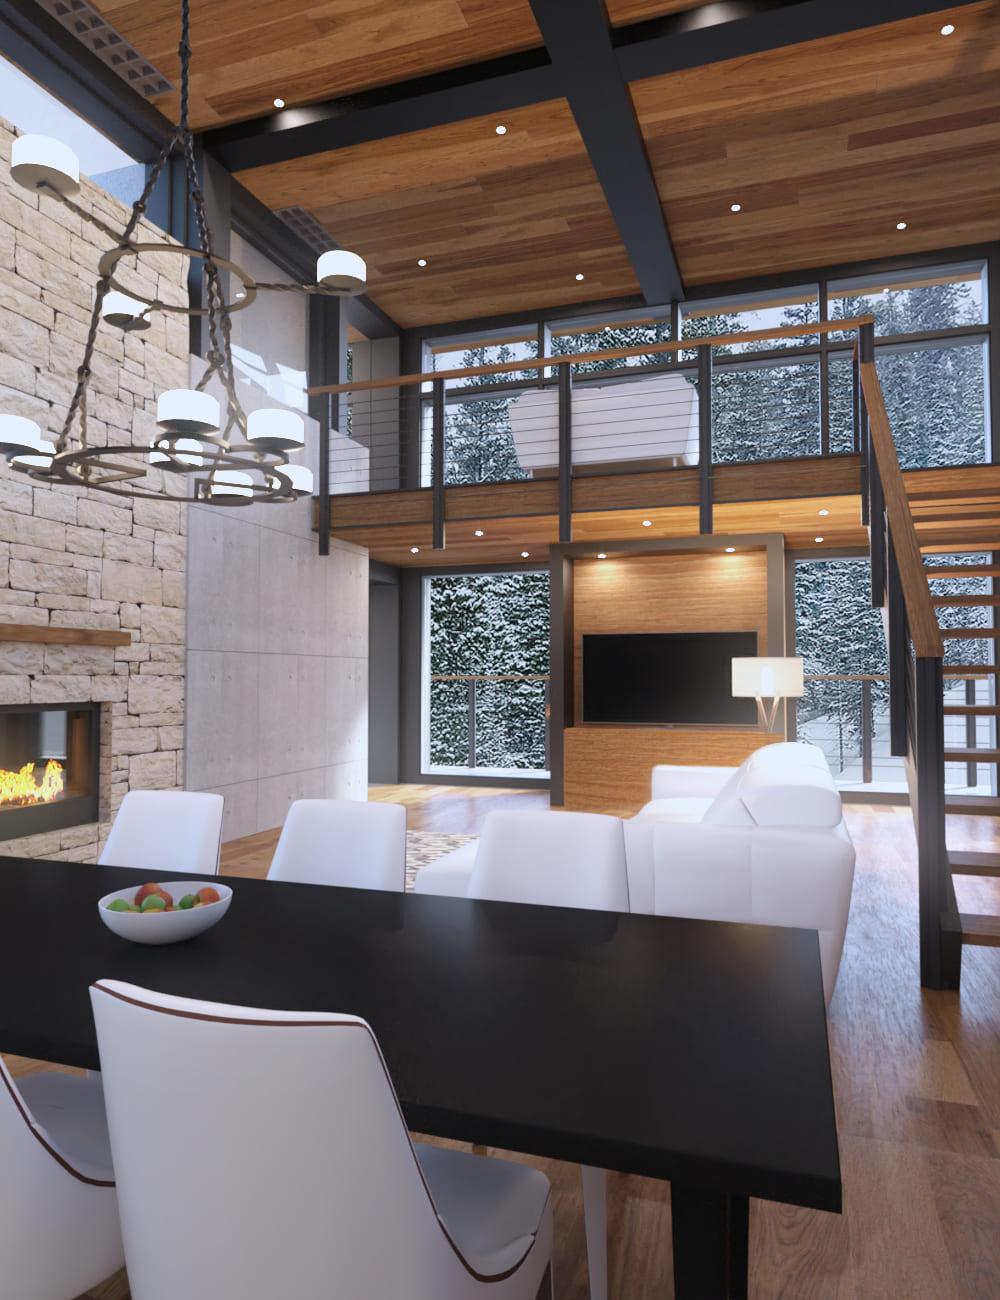 Cozy Winter House_DAZ3D下载站